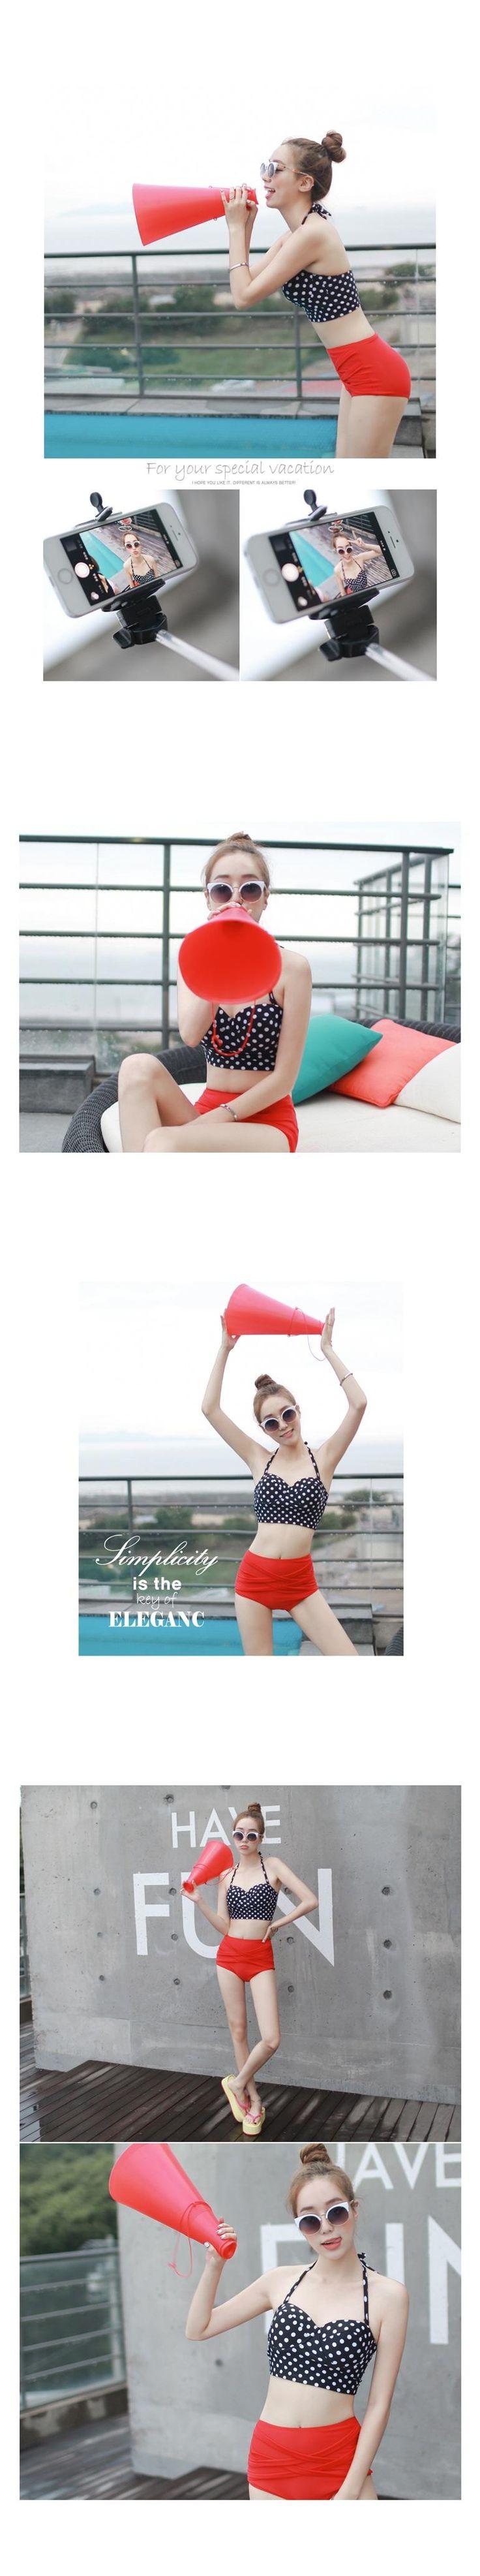 Buy DJ Design Set: Halter Bustier Bikini Top + Mid-Waist Bottoms | YesStyle